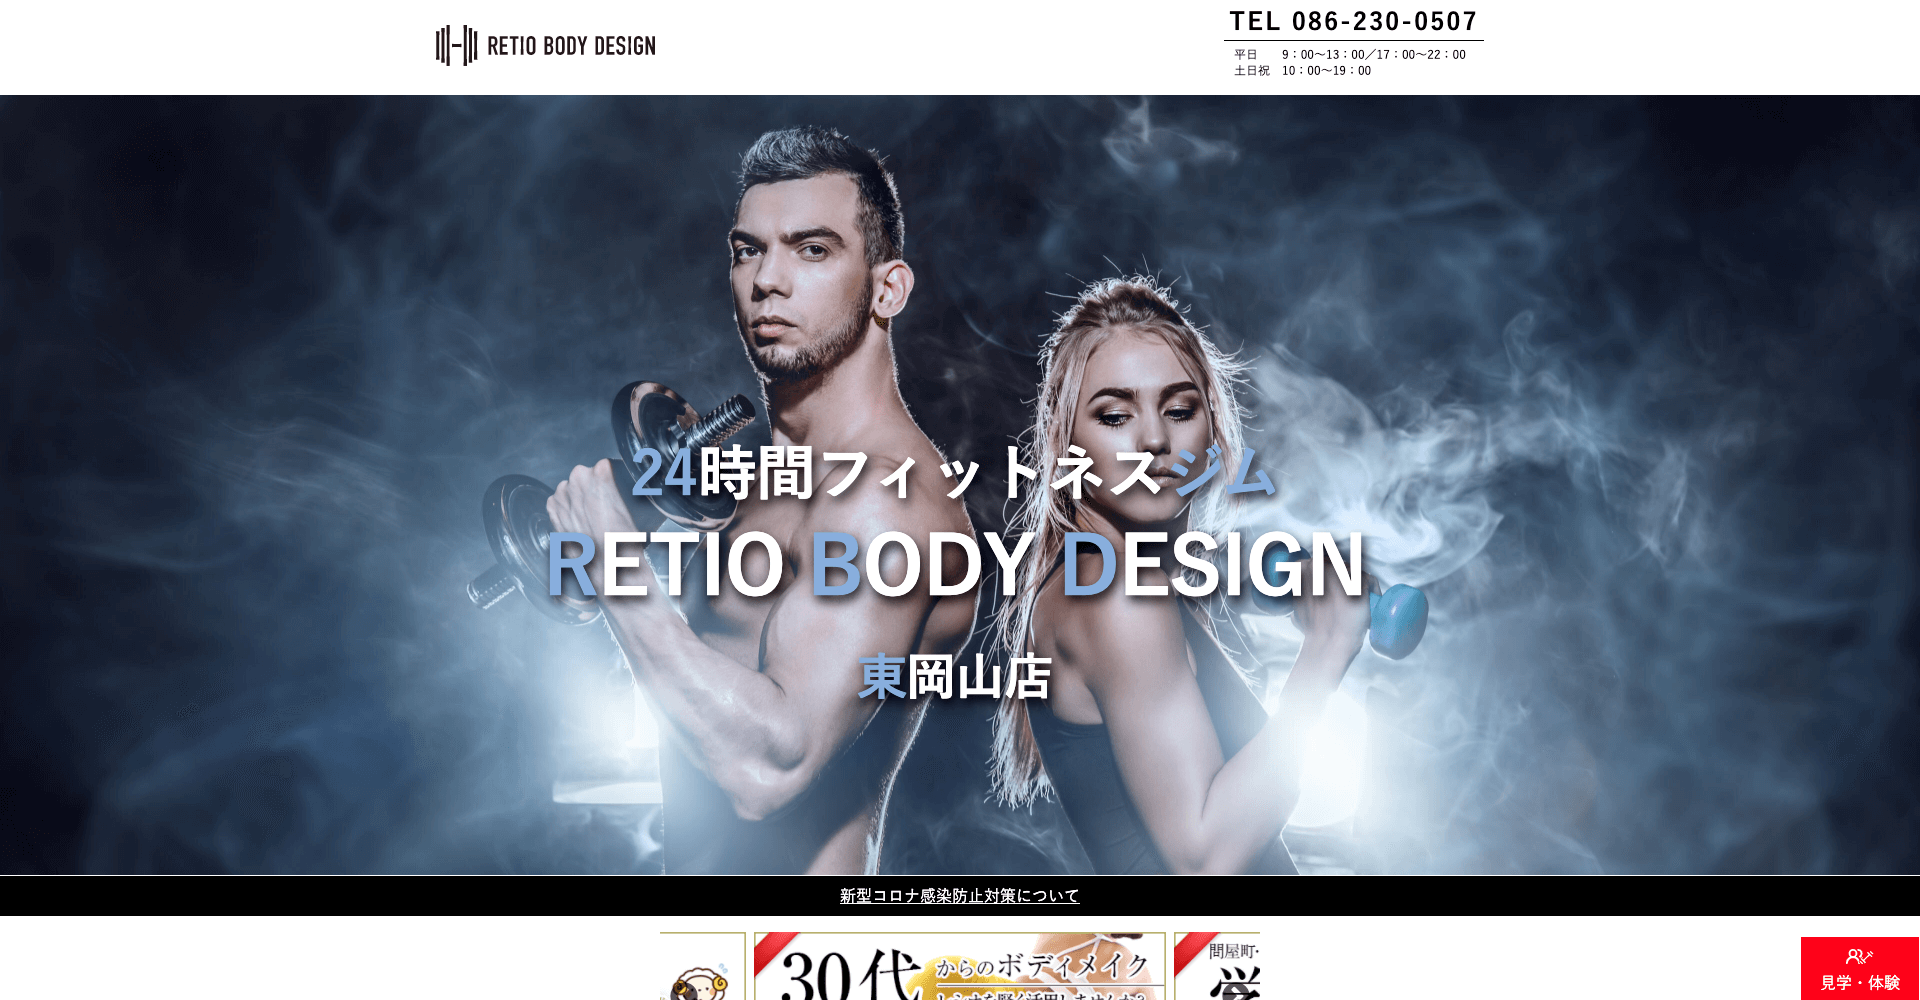 RETIO BODY DESIGN東岡山店/レシオボディデザイン東岡山店